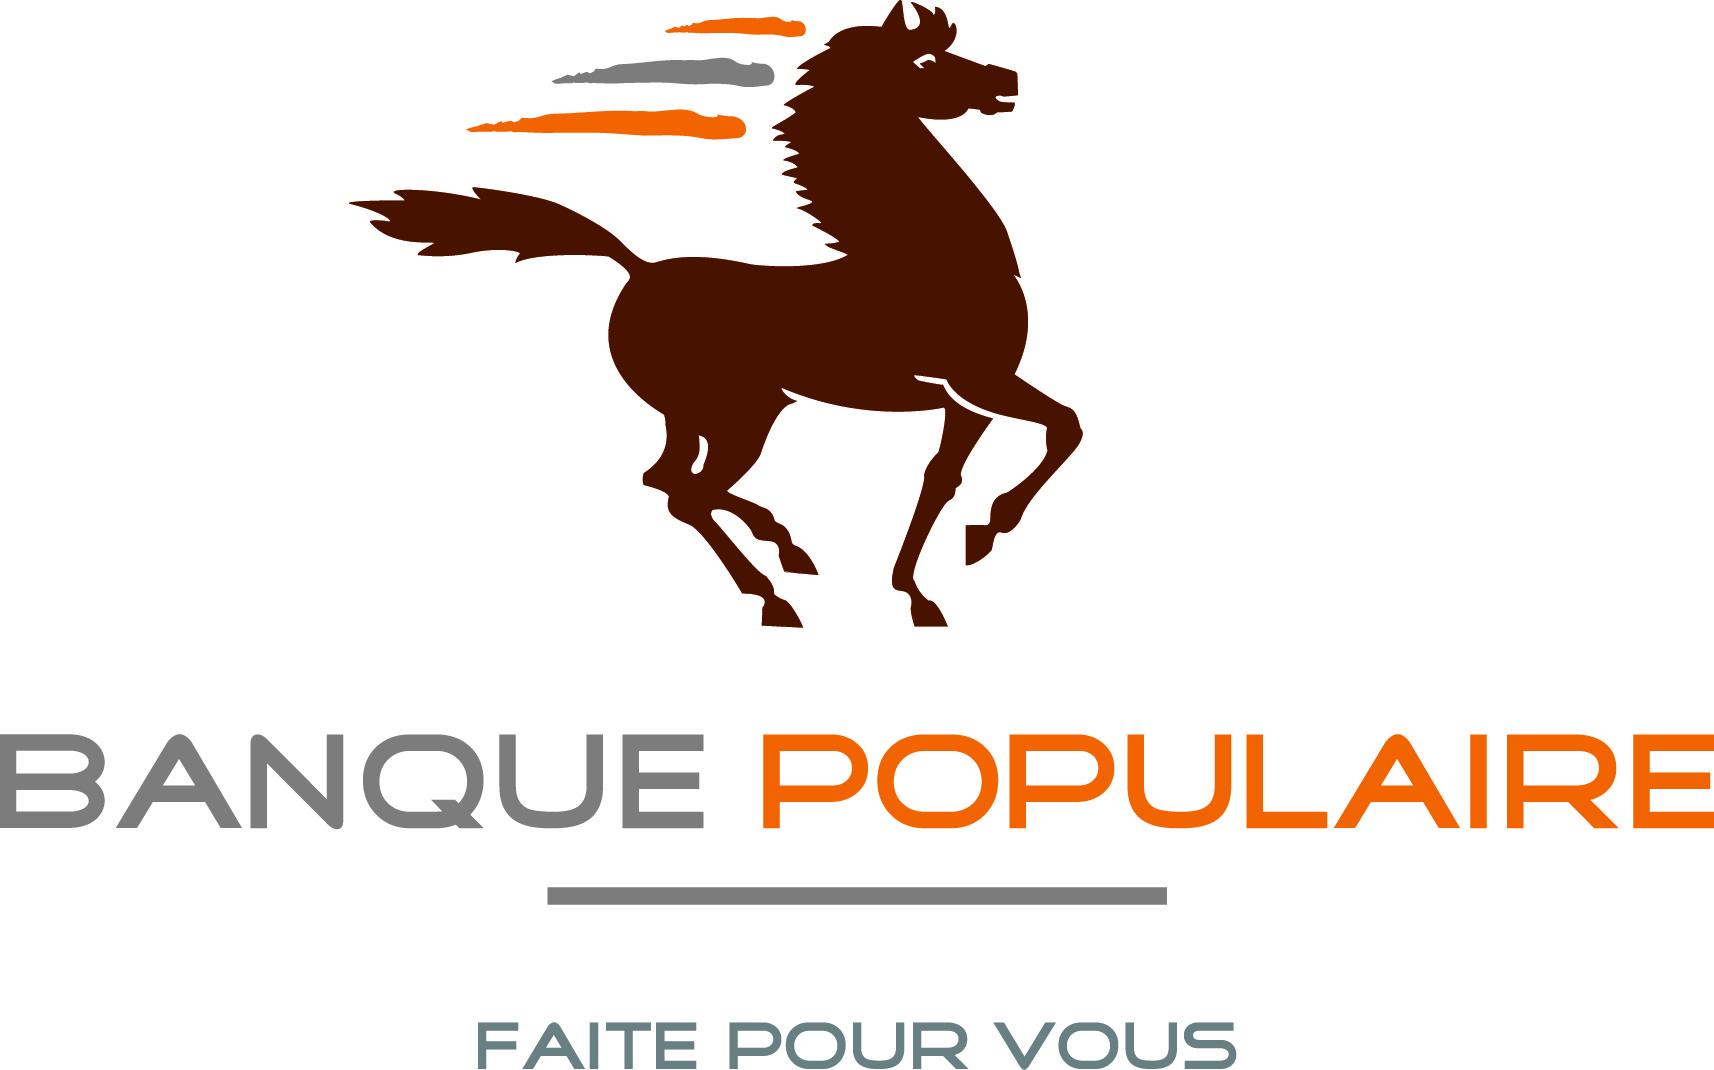 Banque Populaire du Maroc (AR) Logo photo - 1